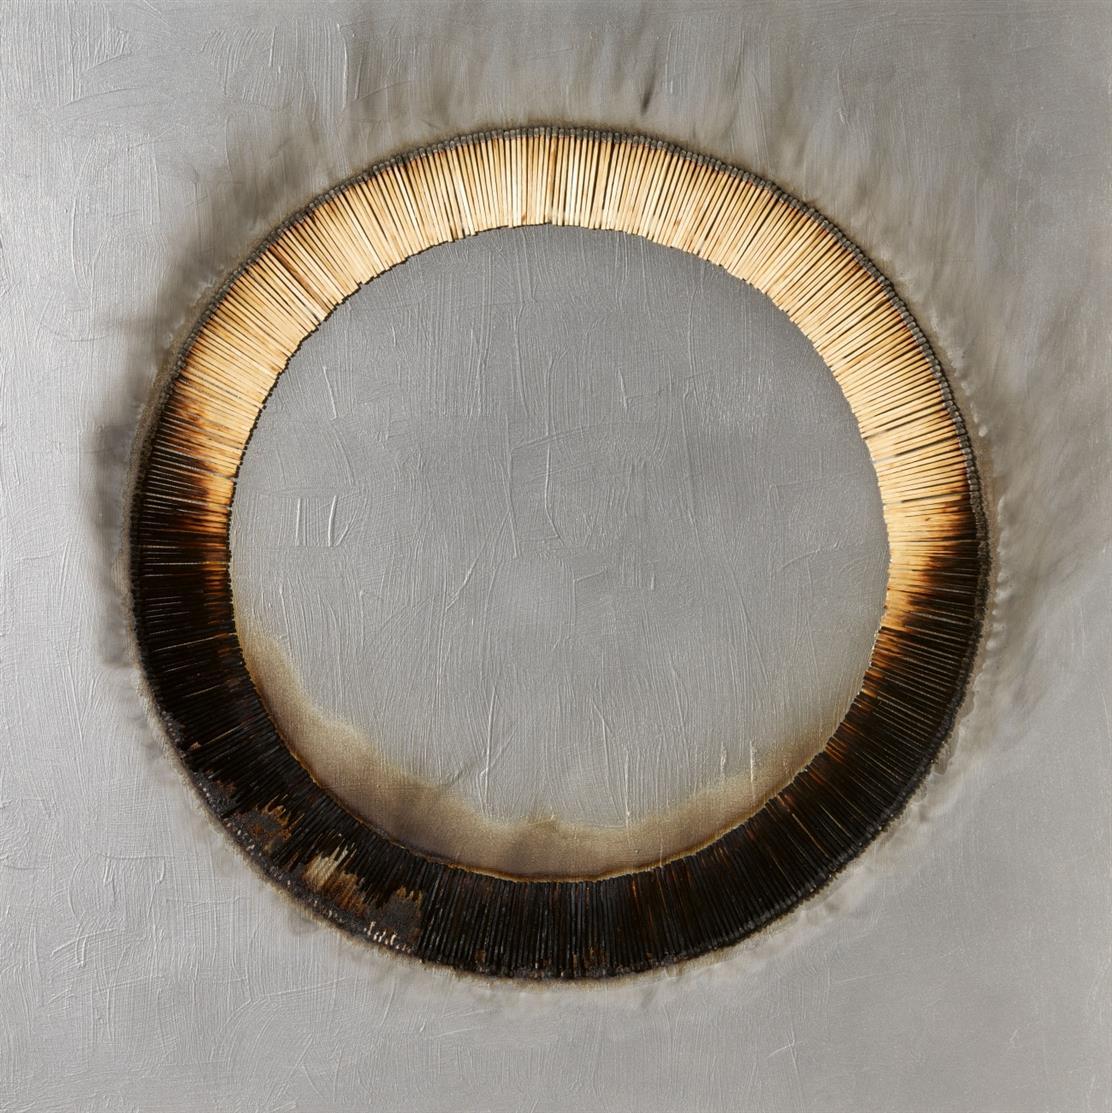 Bernard Aubertin. Dessin de feu circulaire gris. 2005. Öl, Zündhölzer und Brandspuren auf Holz. Verso signiert. + Dazu: Fotozertifikat.